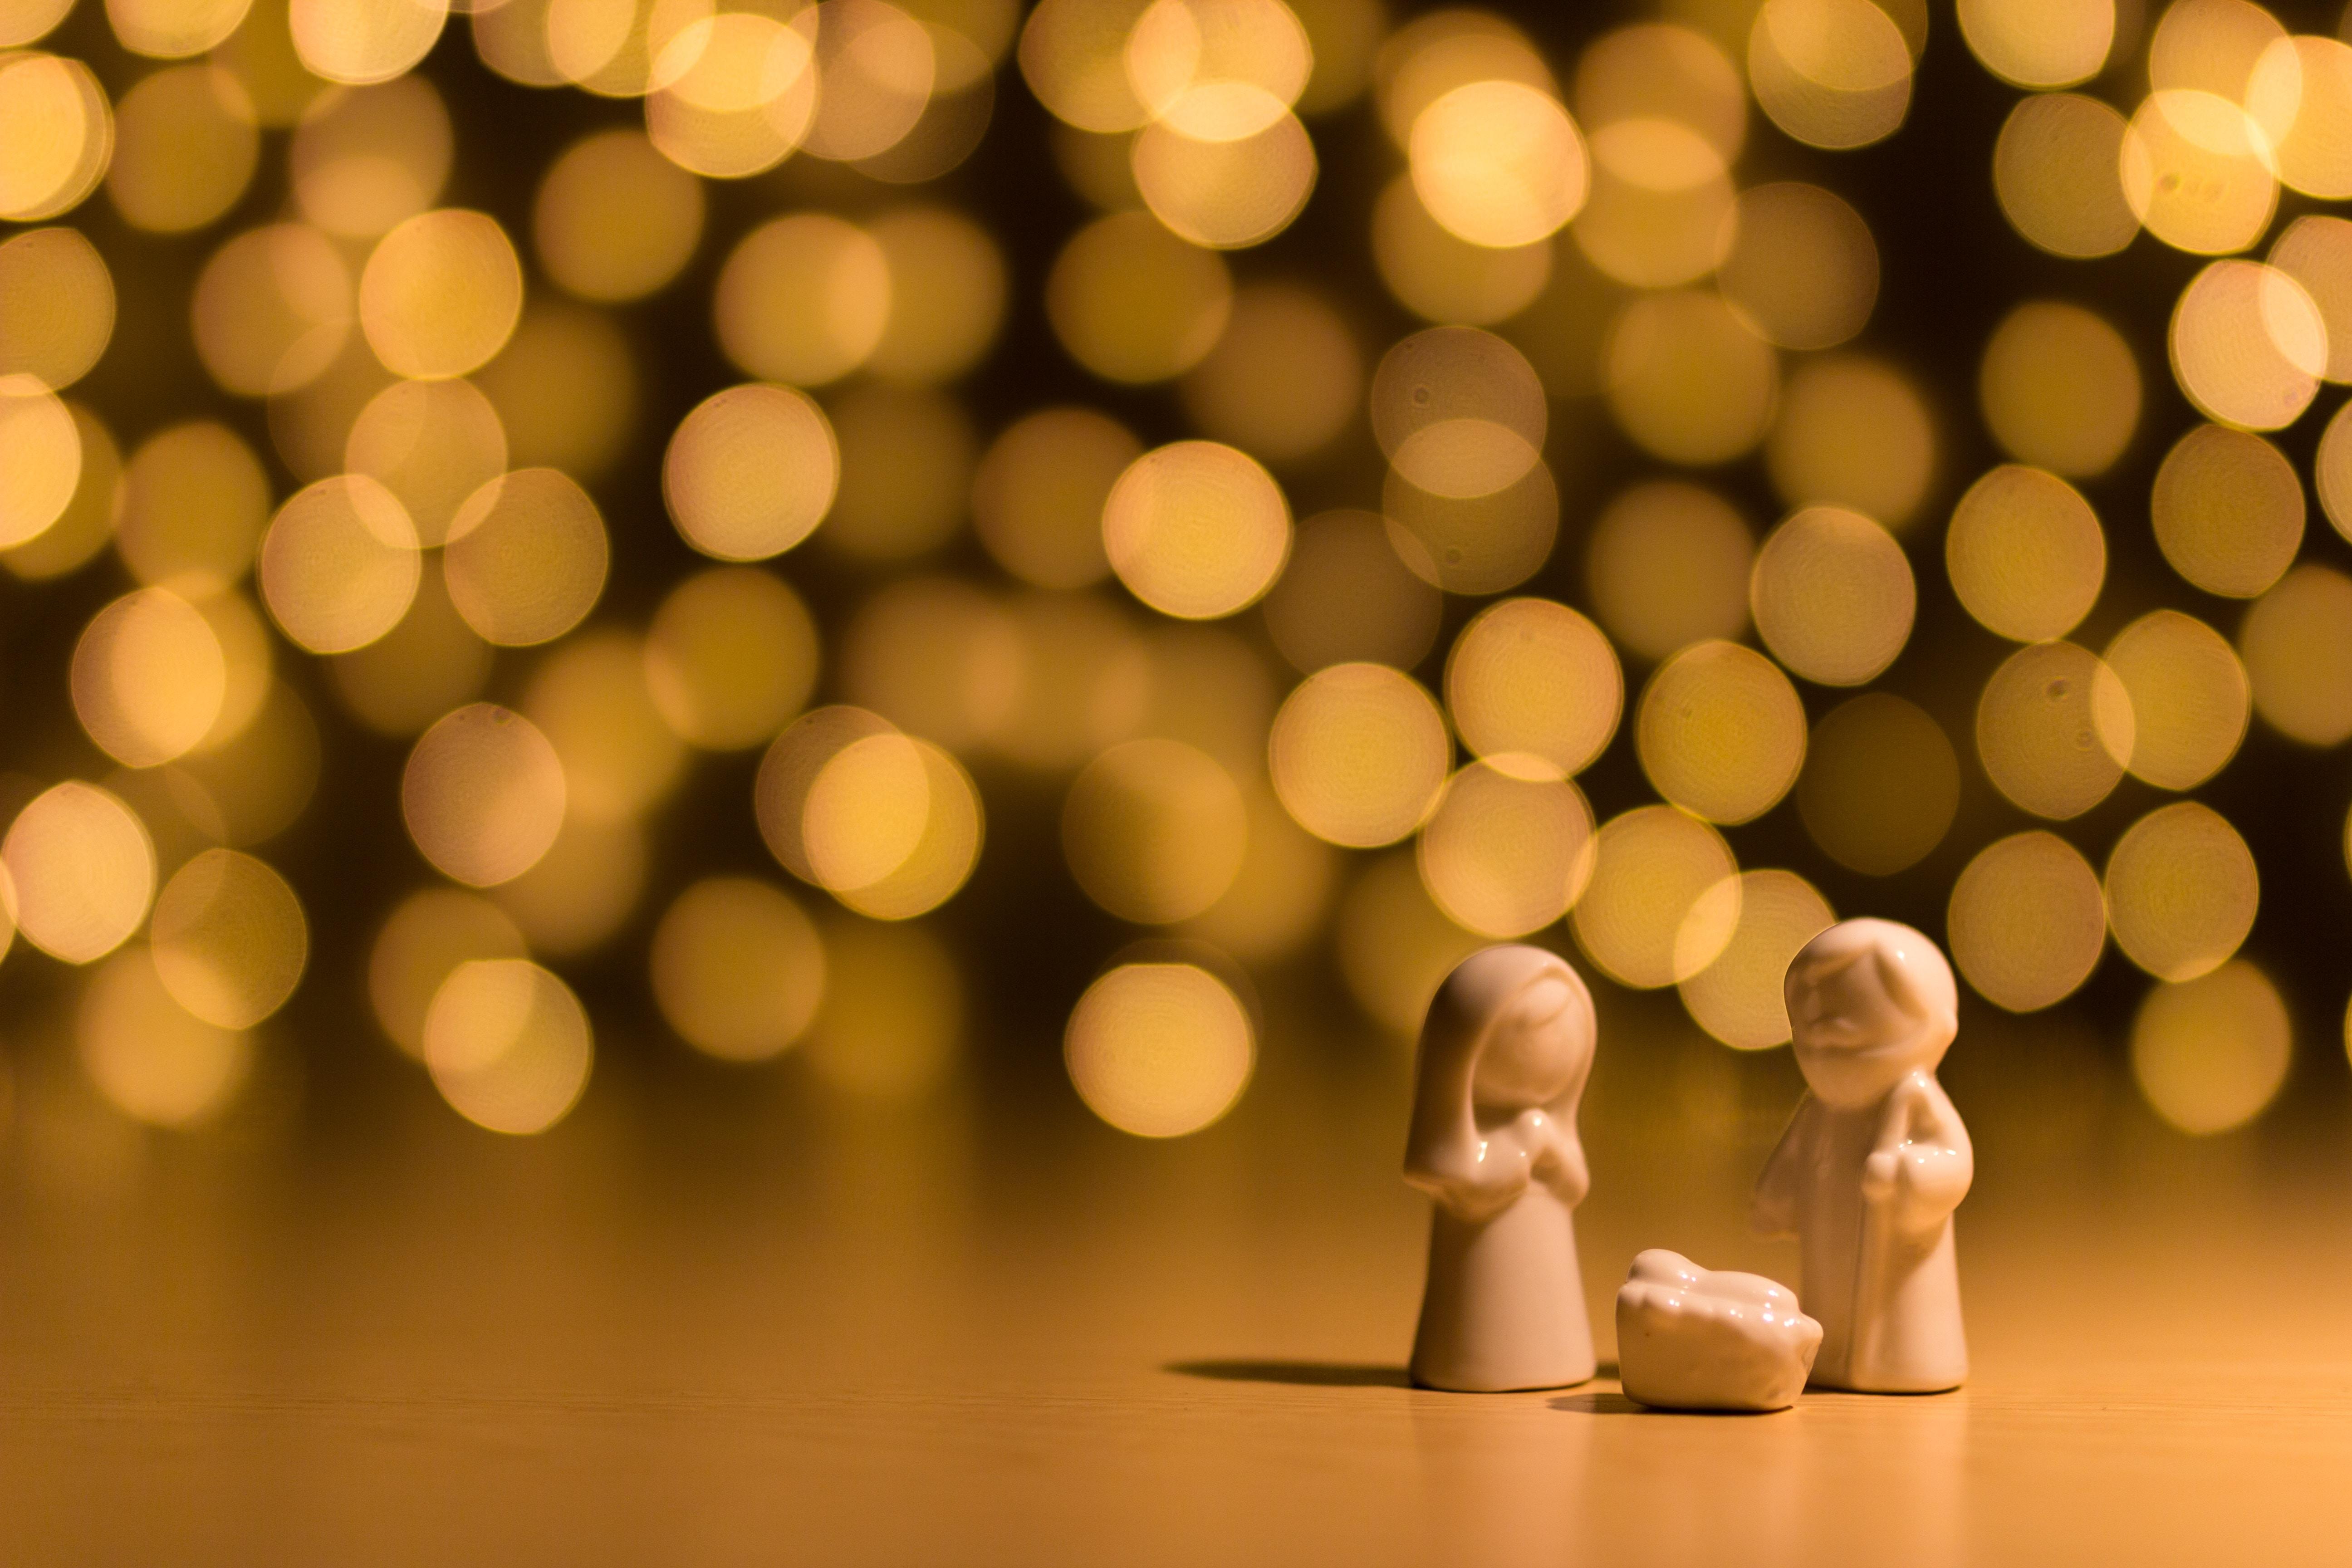 shallow focus photo of the Nativity figurine